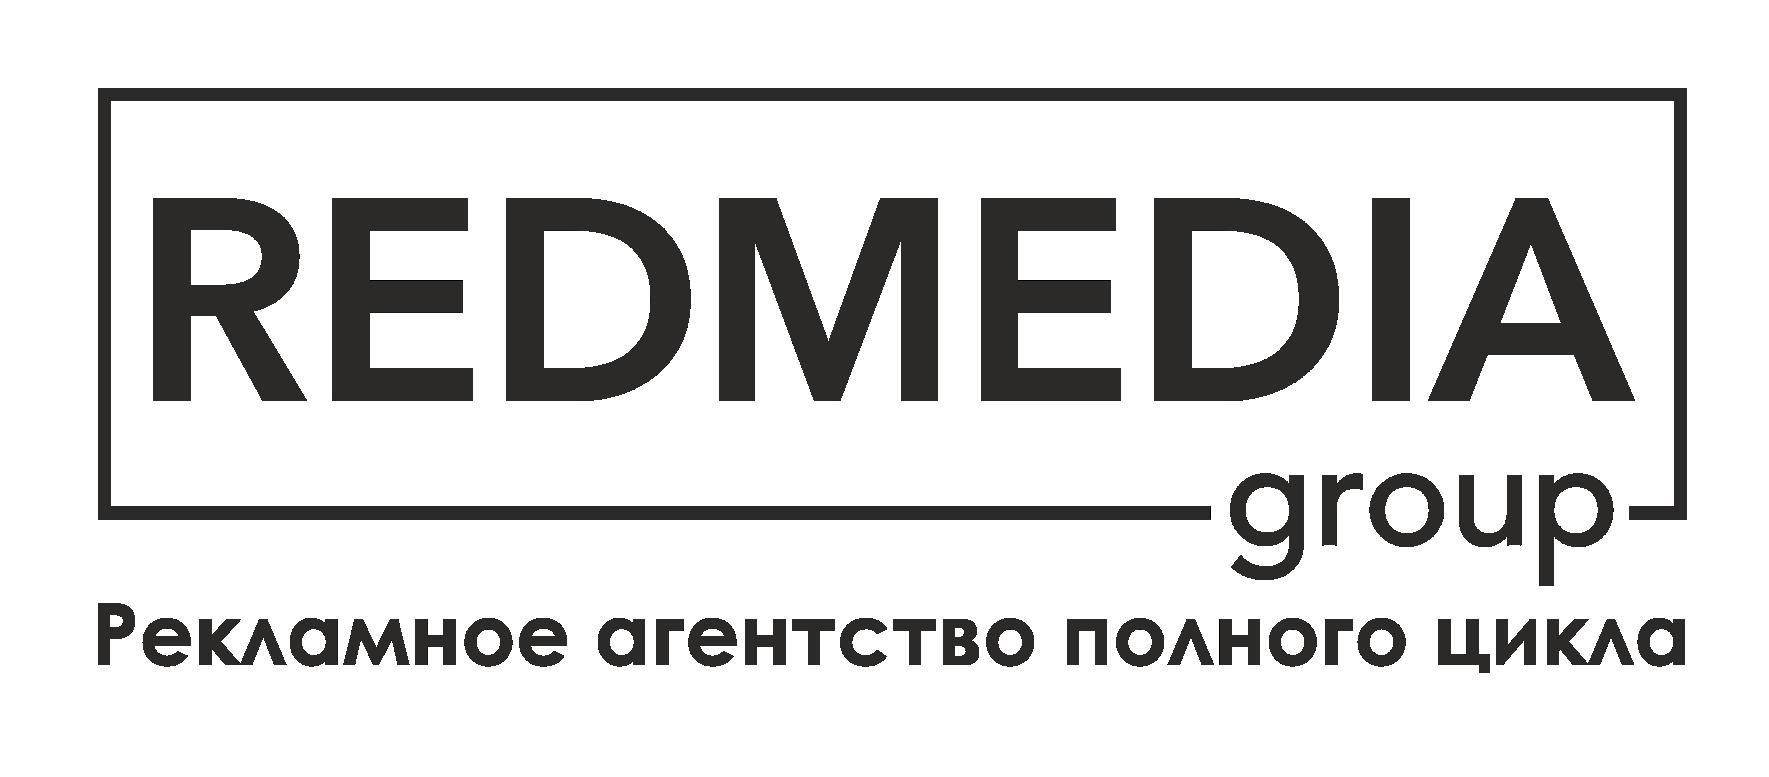 Рекламное агентство полного цикла RedMedia Group г. Москва